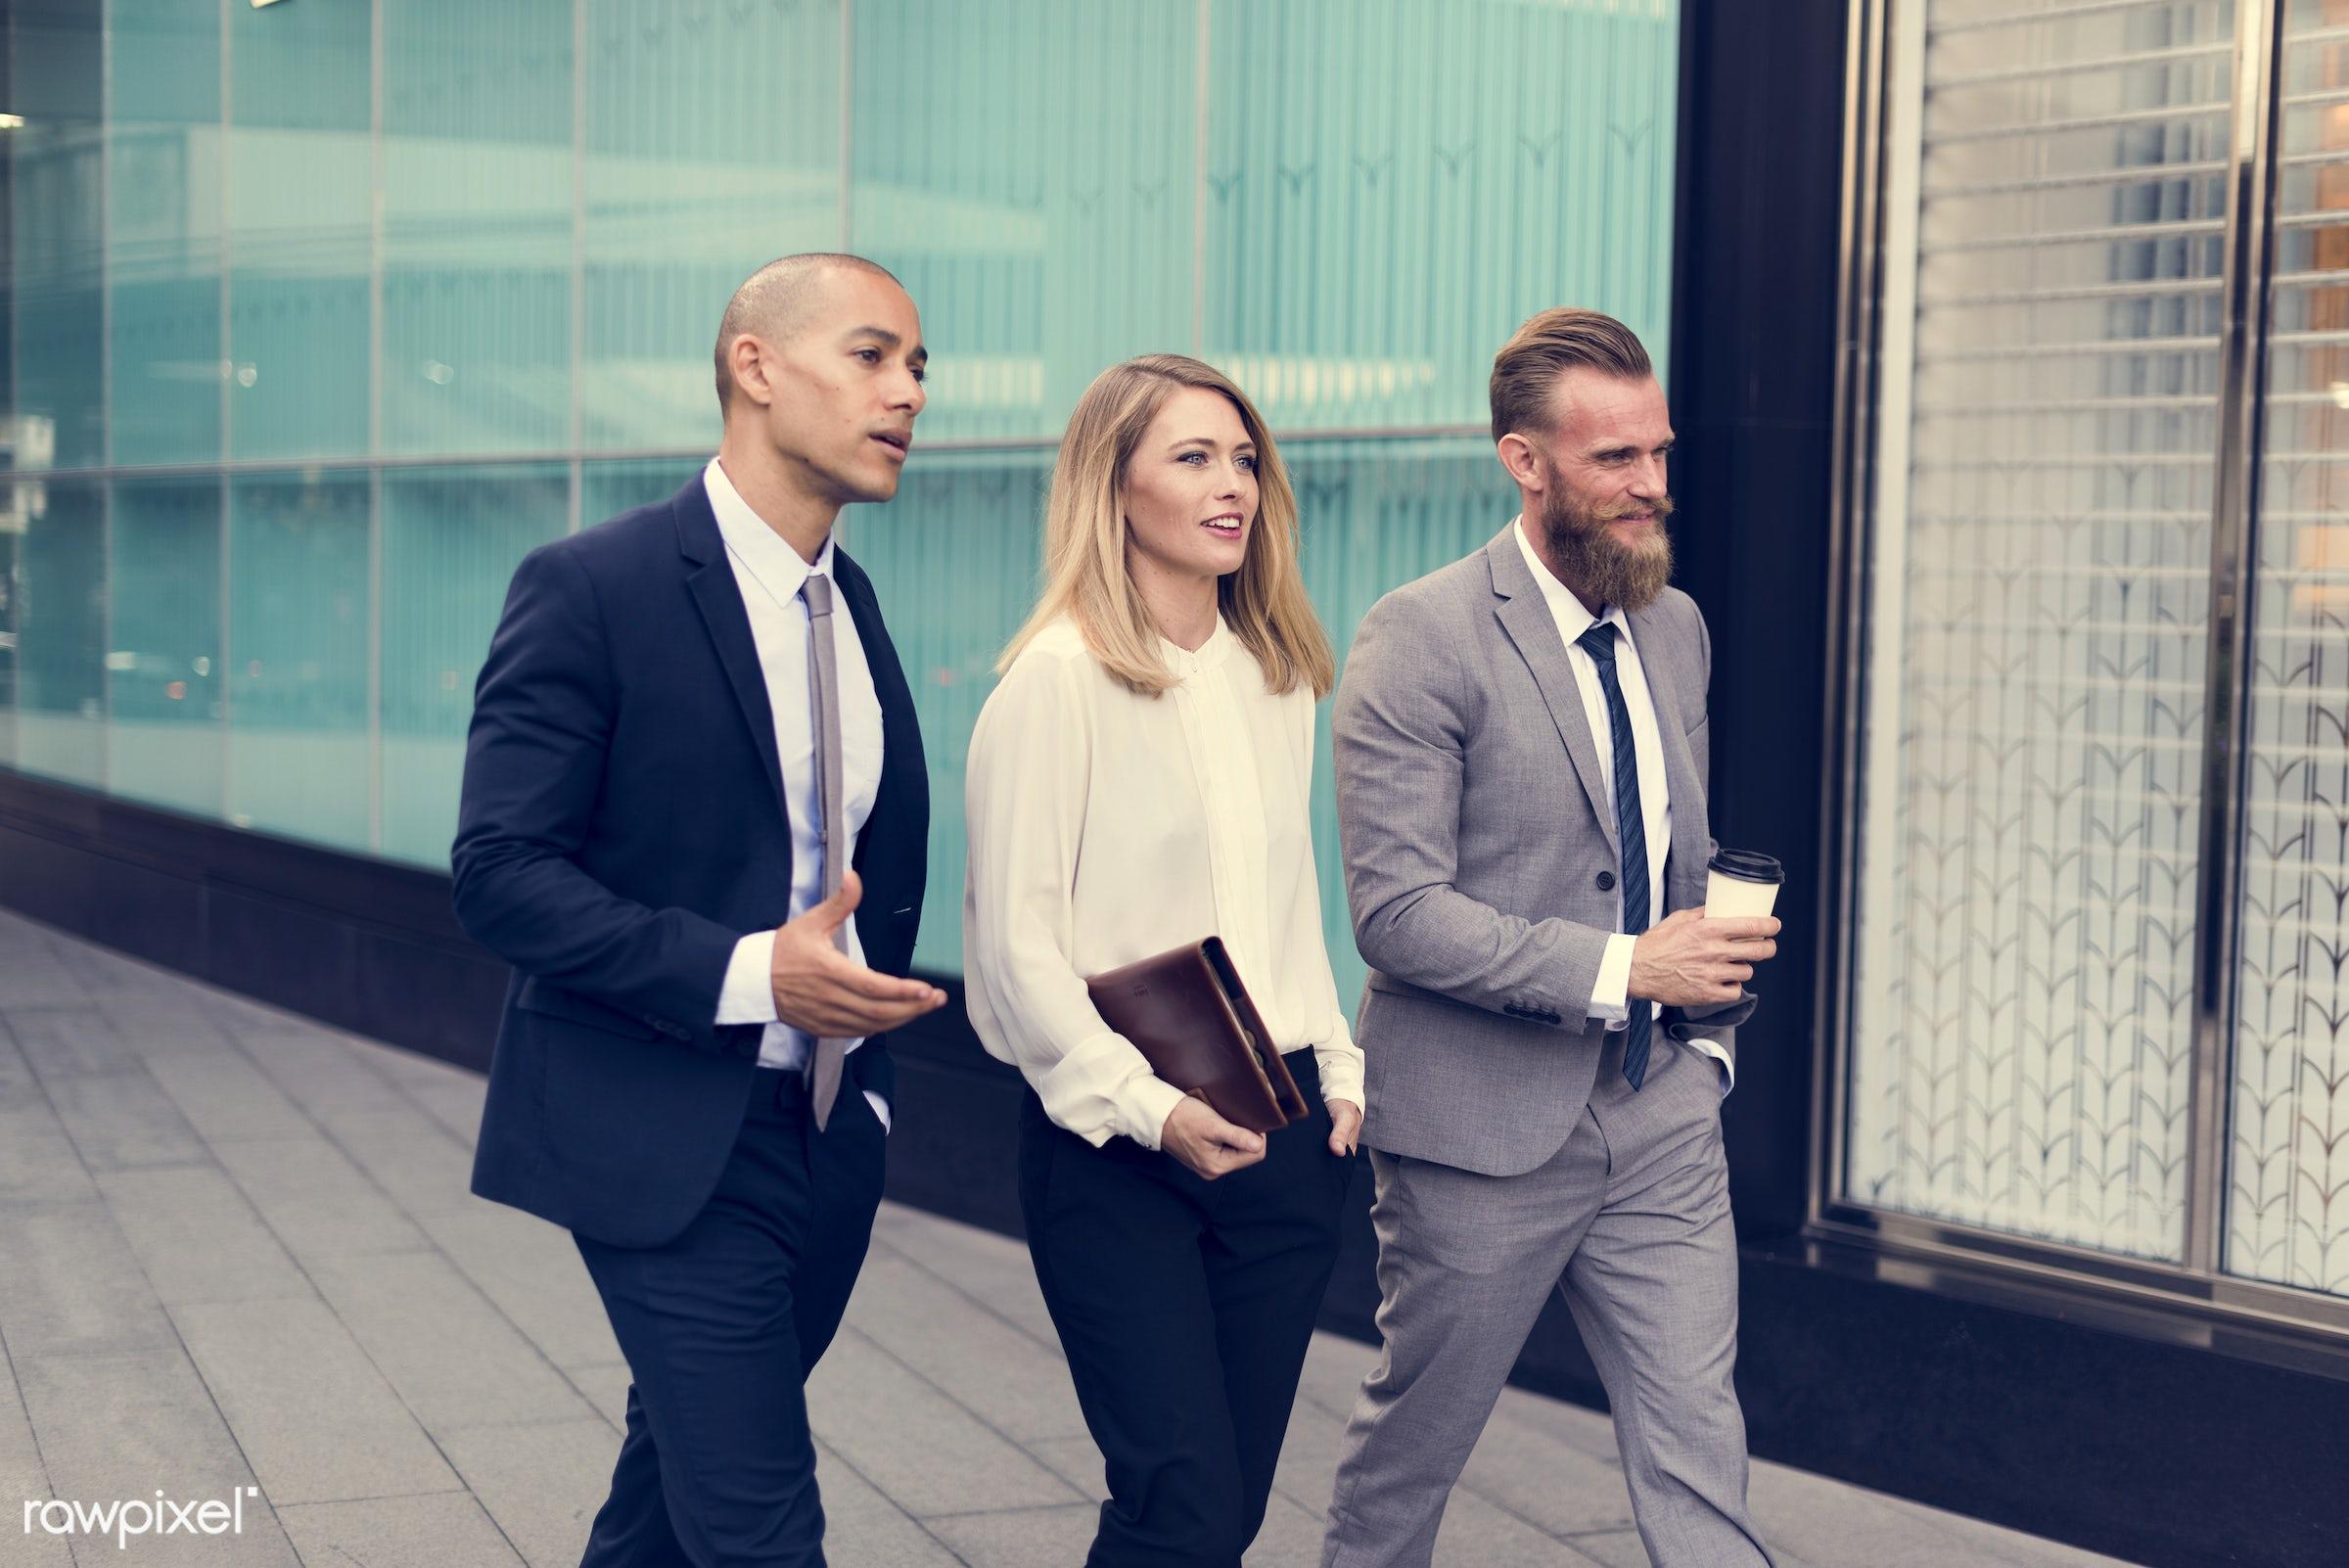 person, suit and tie, white collar worker, people, business, caucasian, break, friends, hands, businesswomen, woman,...